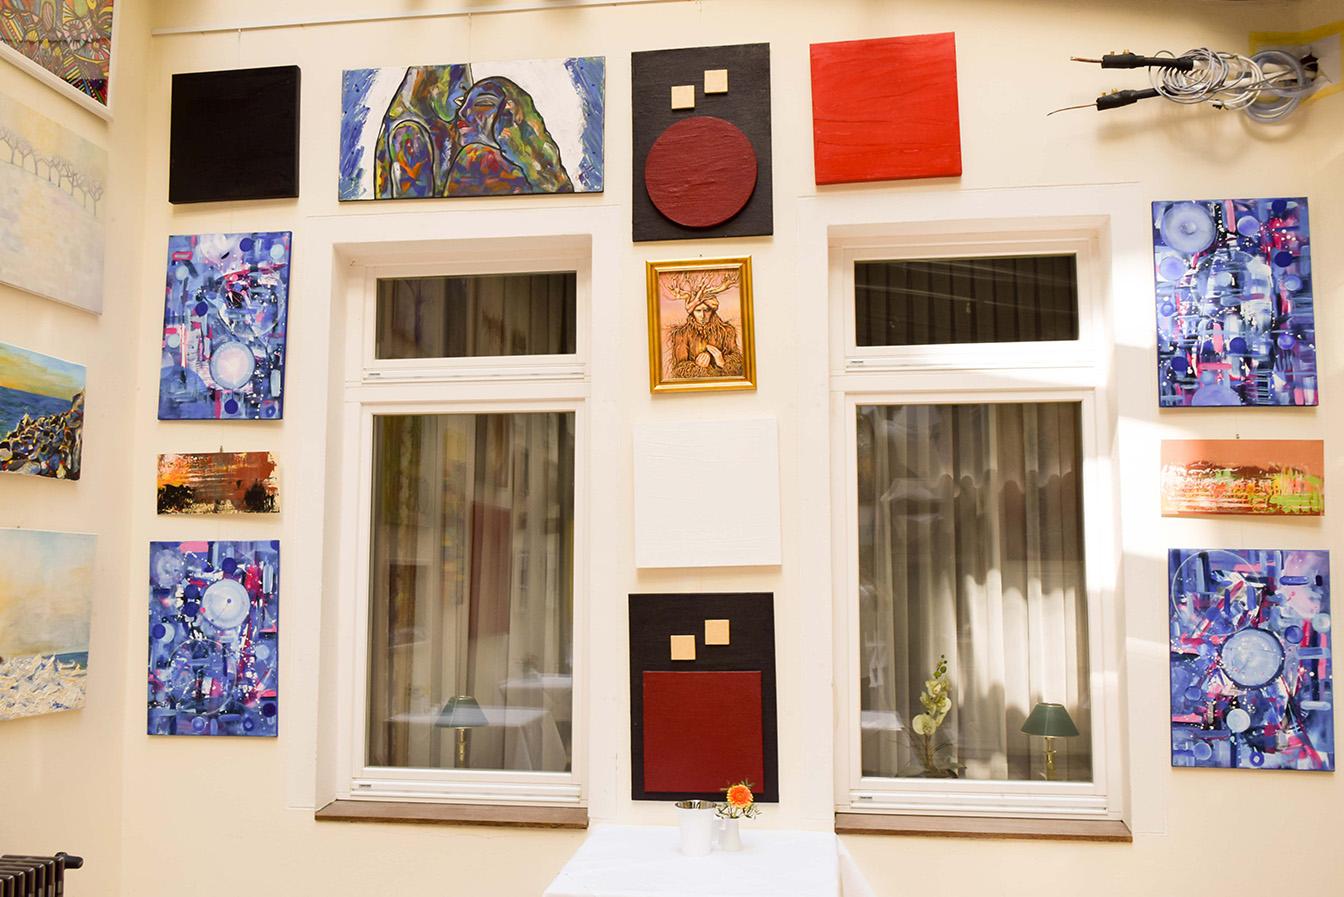 myer s hotel berlin prenzlauer berg exhibition br cken bauen abriendo puentes. Black Bedroom Furniture Sets. Home Design Ideas